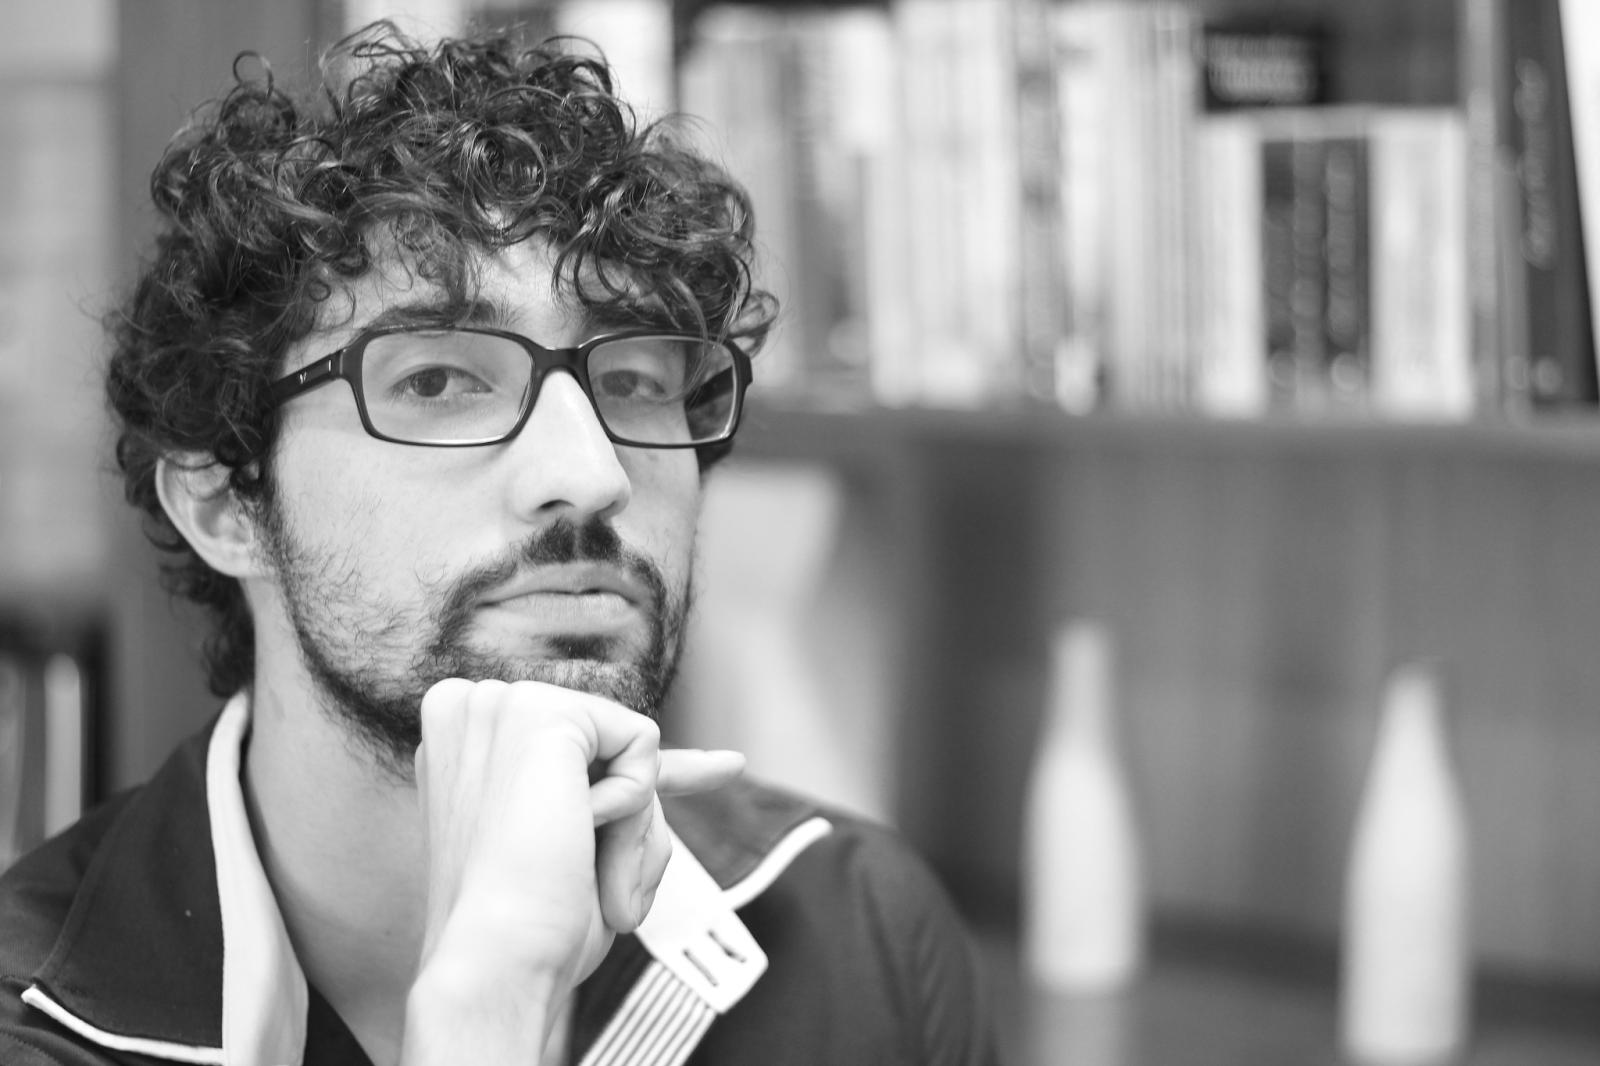 Marlon Antonio Colunista de Araxá